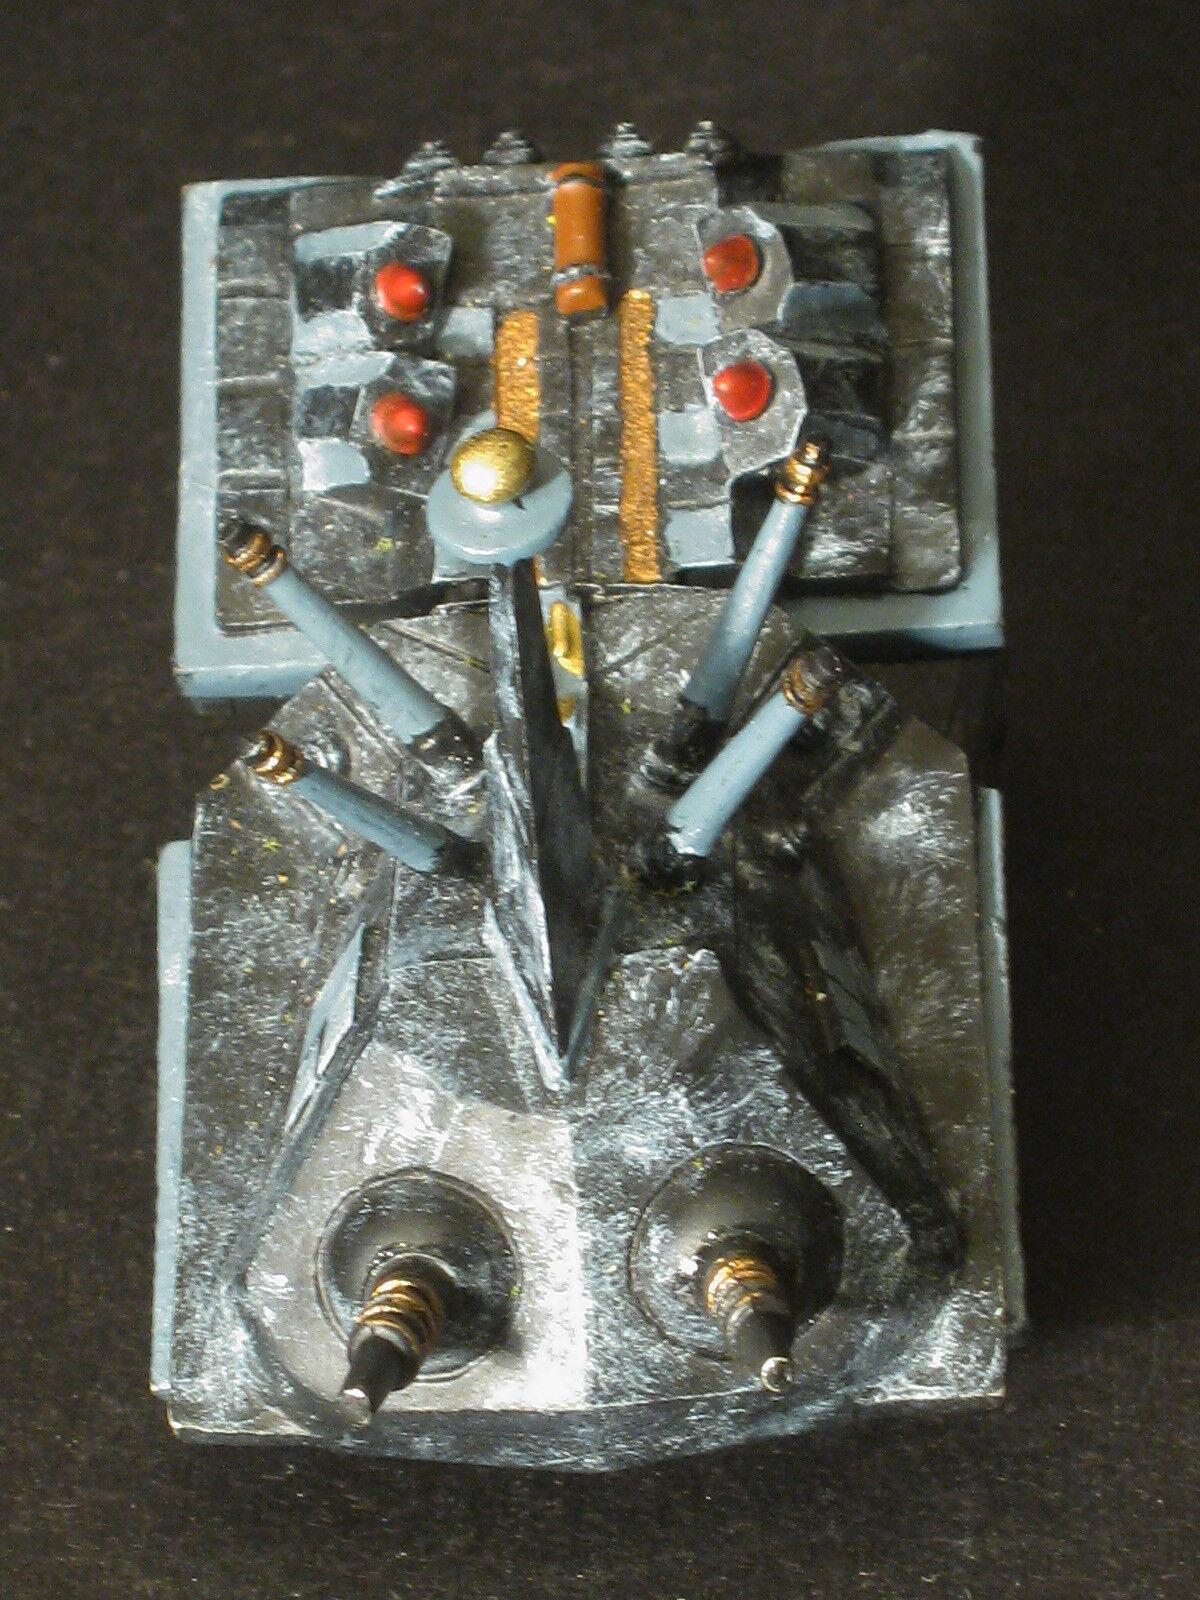 Ogro Mark III-B Pintado En Miniatura, GEV MicroJuego, Jackson Juegos, gran megaextra